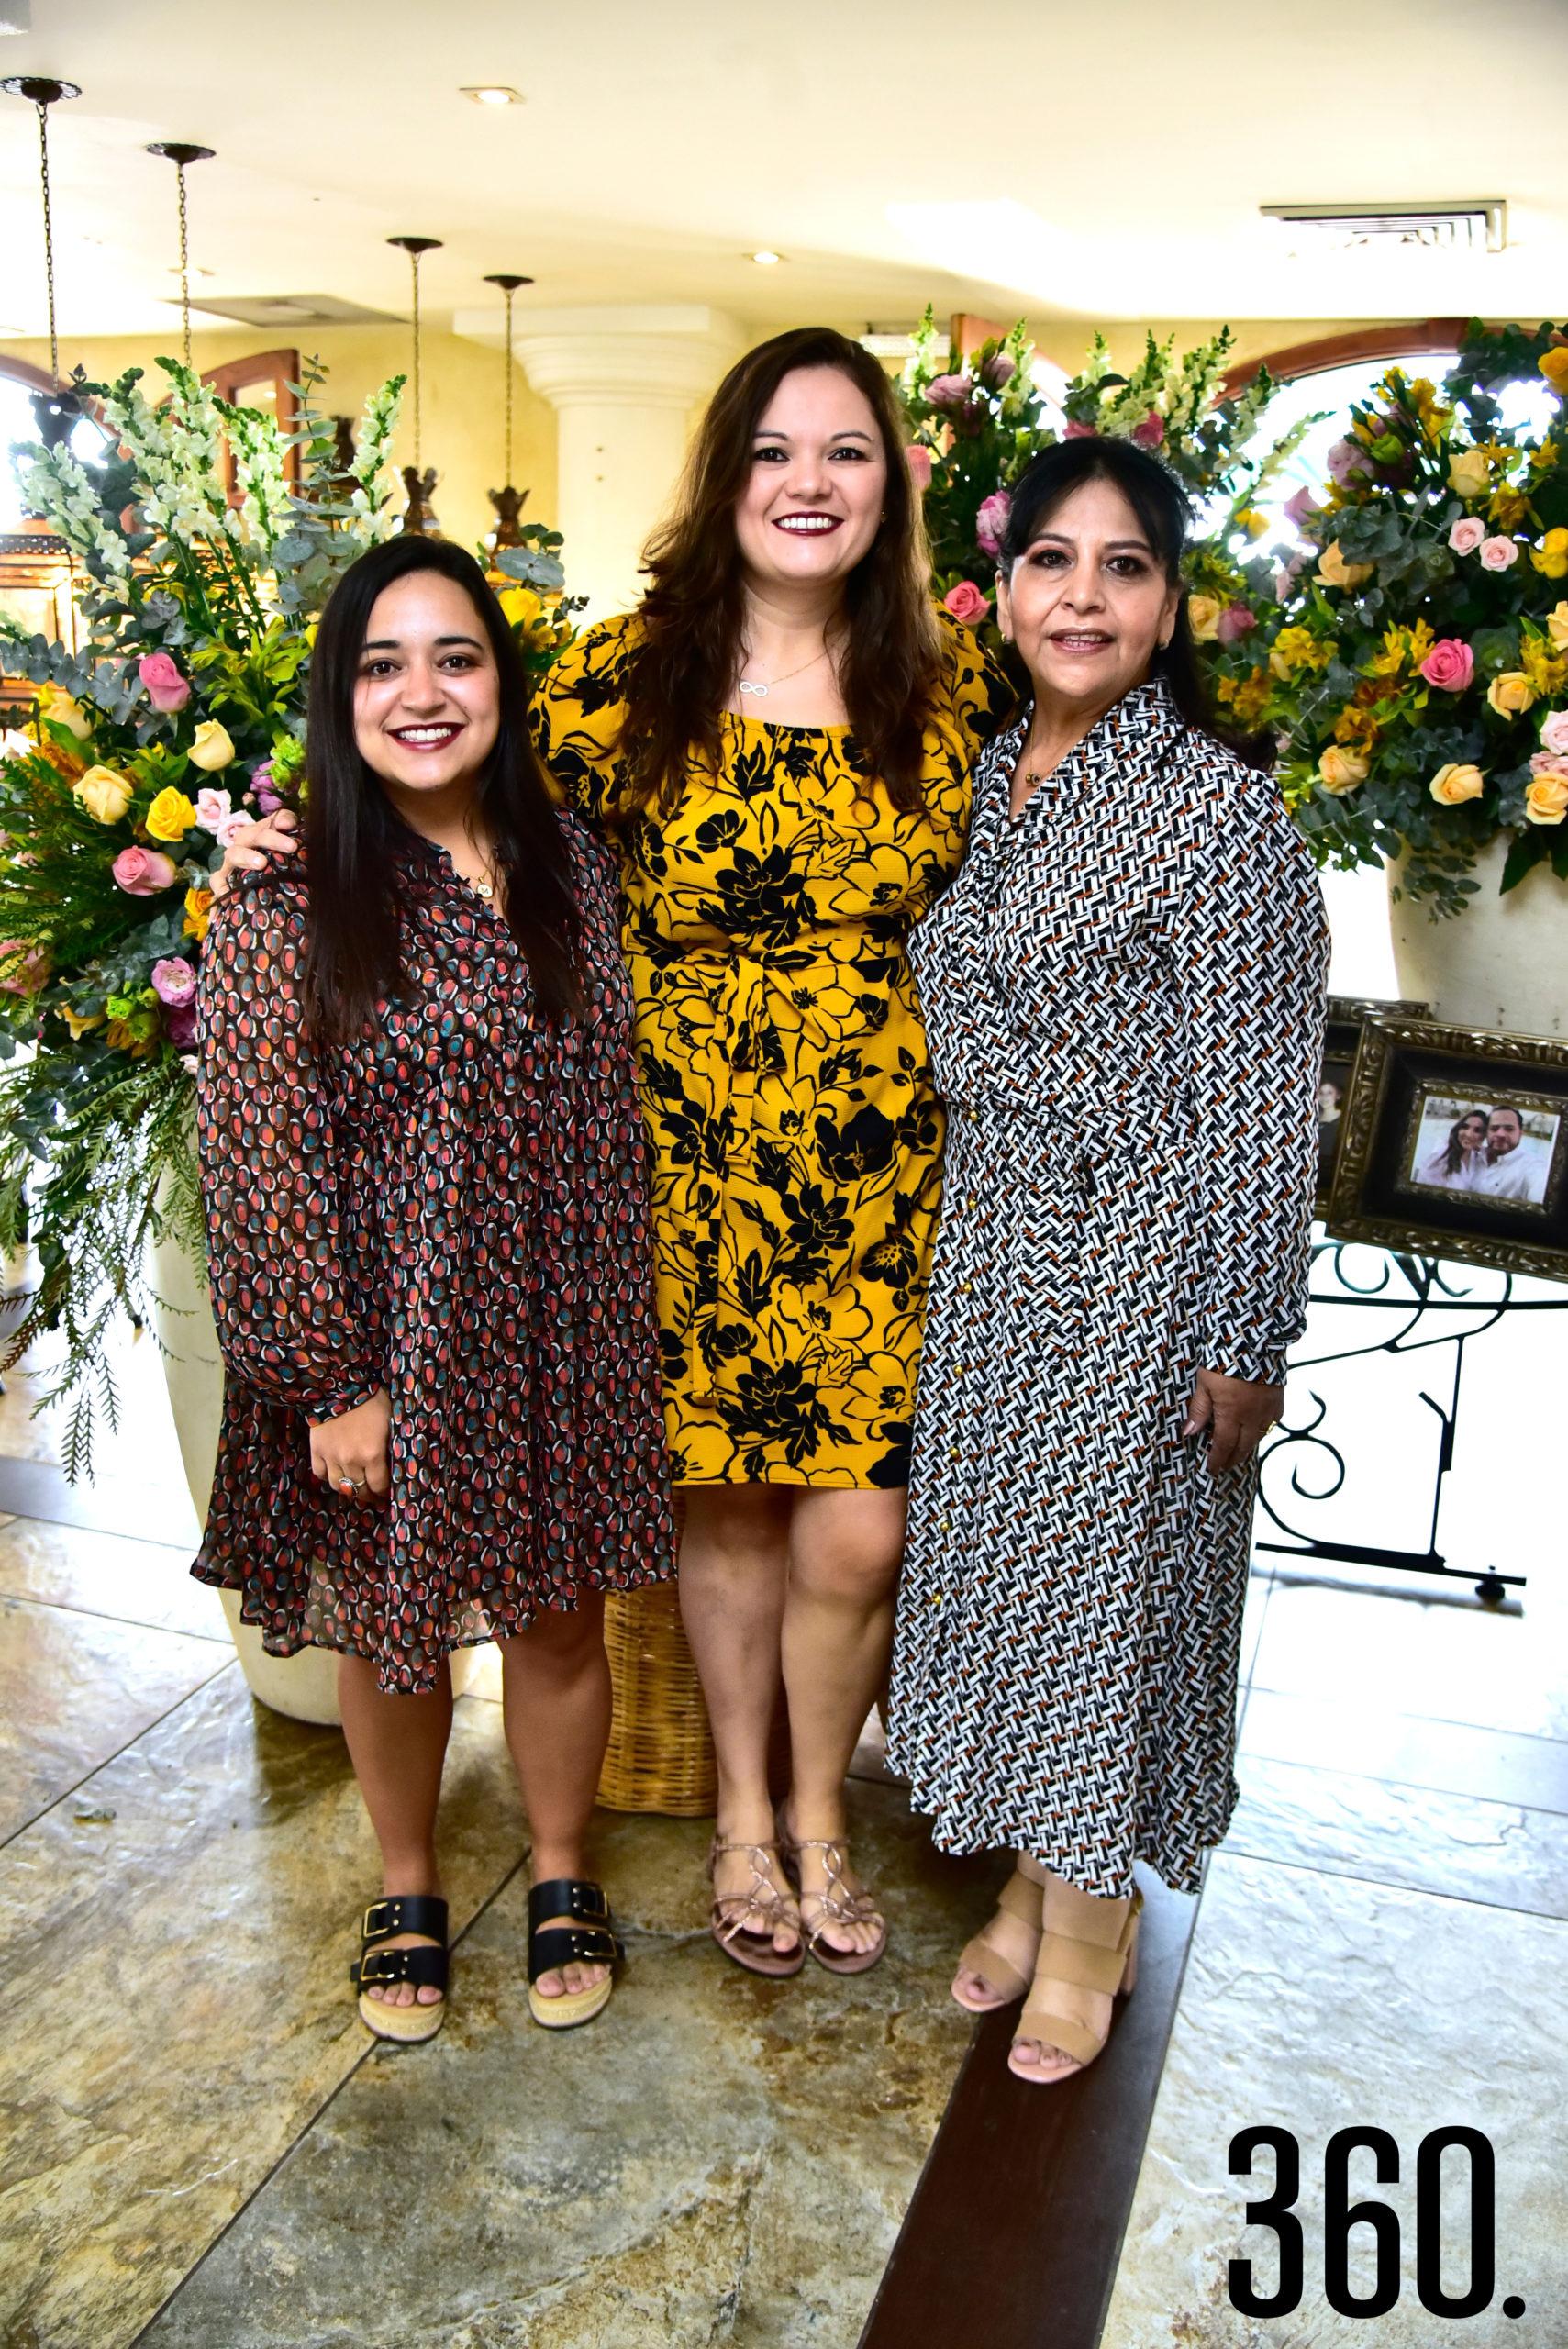 Mariana Delgado, Anahí Cantú y Sandra Carrillo.